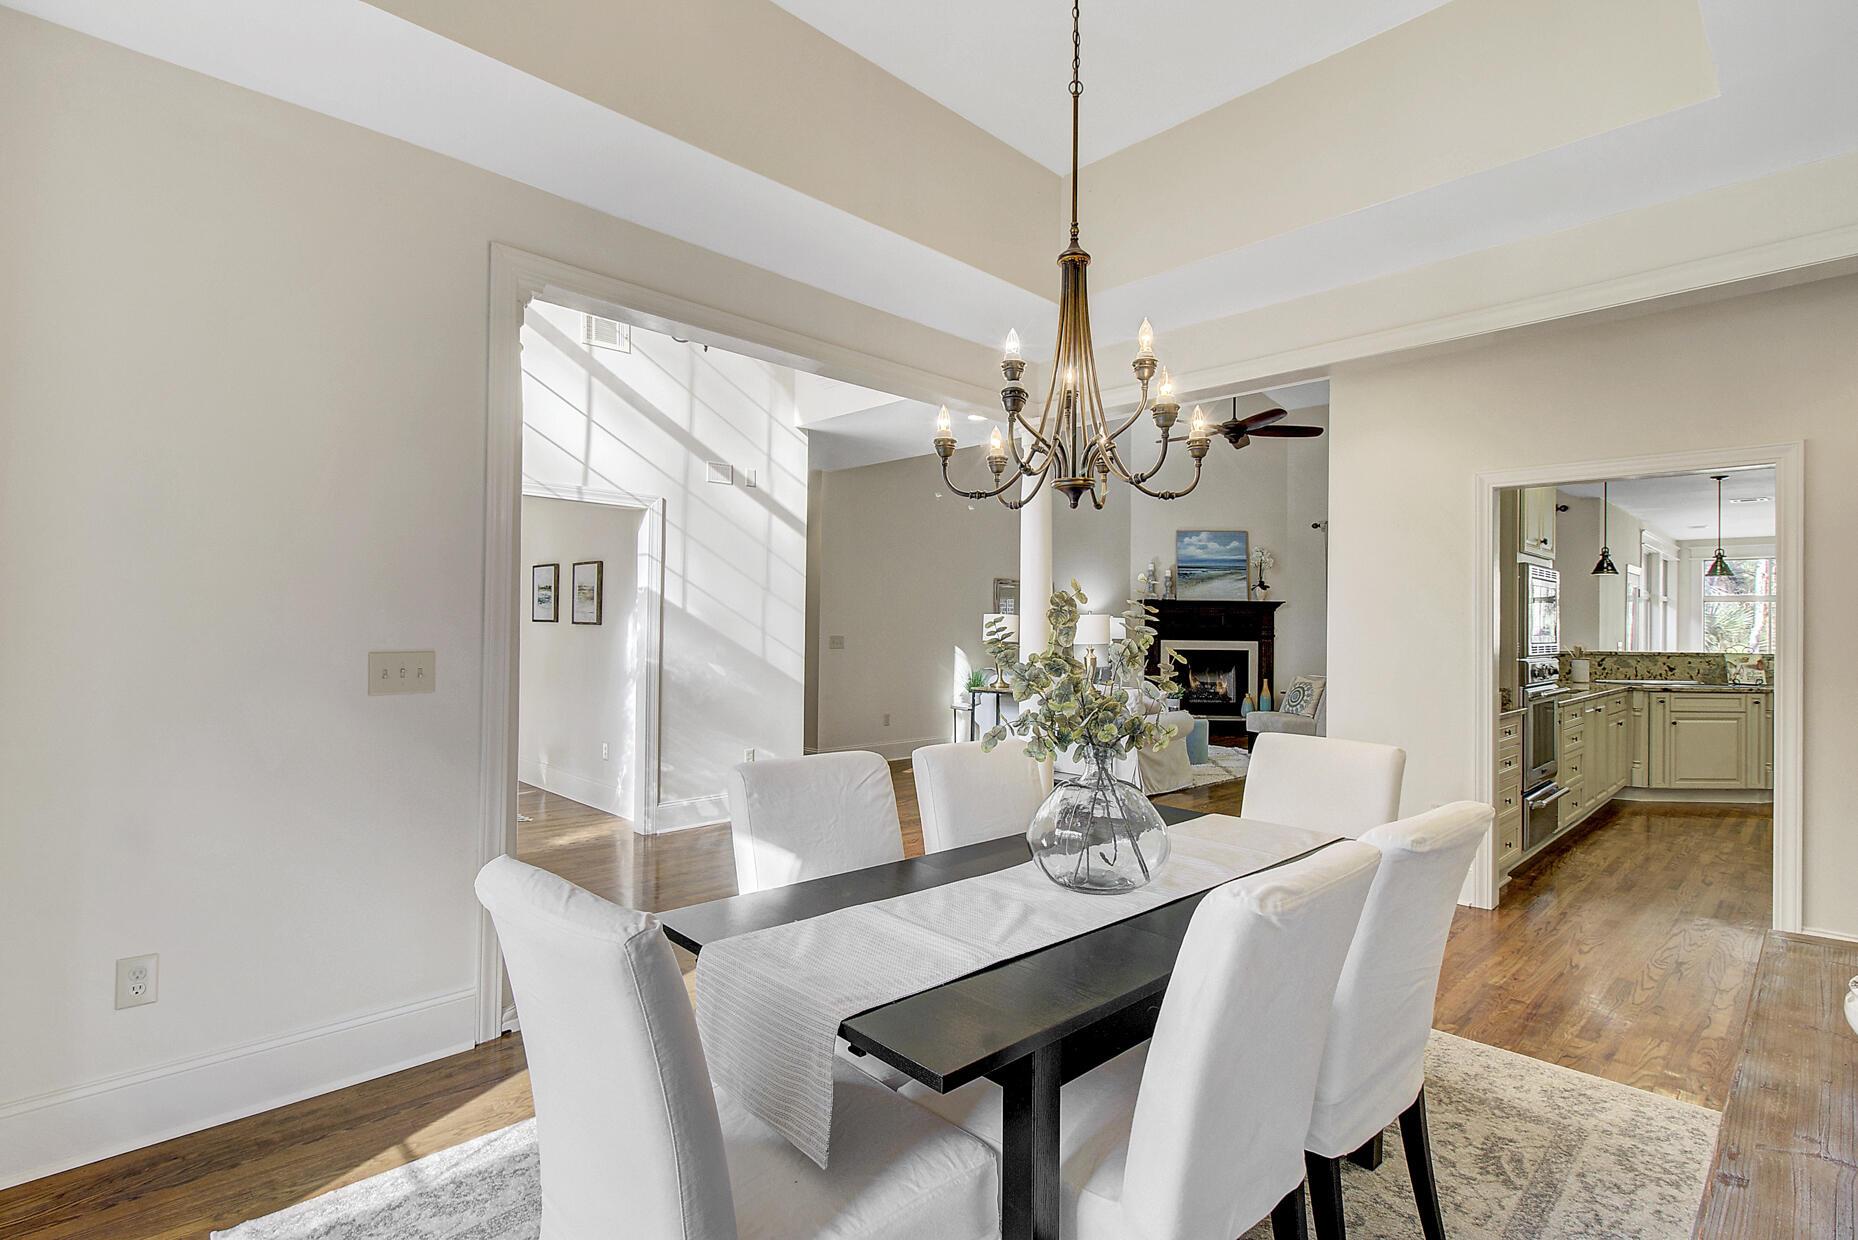 Dunes West Homes For Sale - 4123 Colonel Vanderhorst, Mount Pleasant, SC - 25